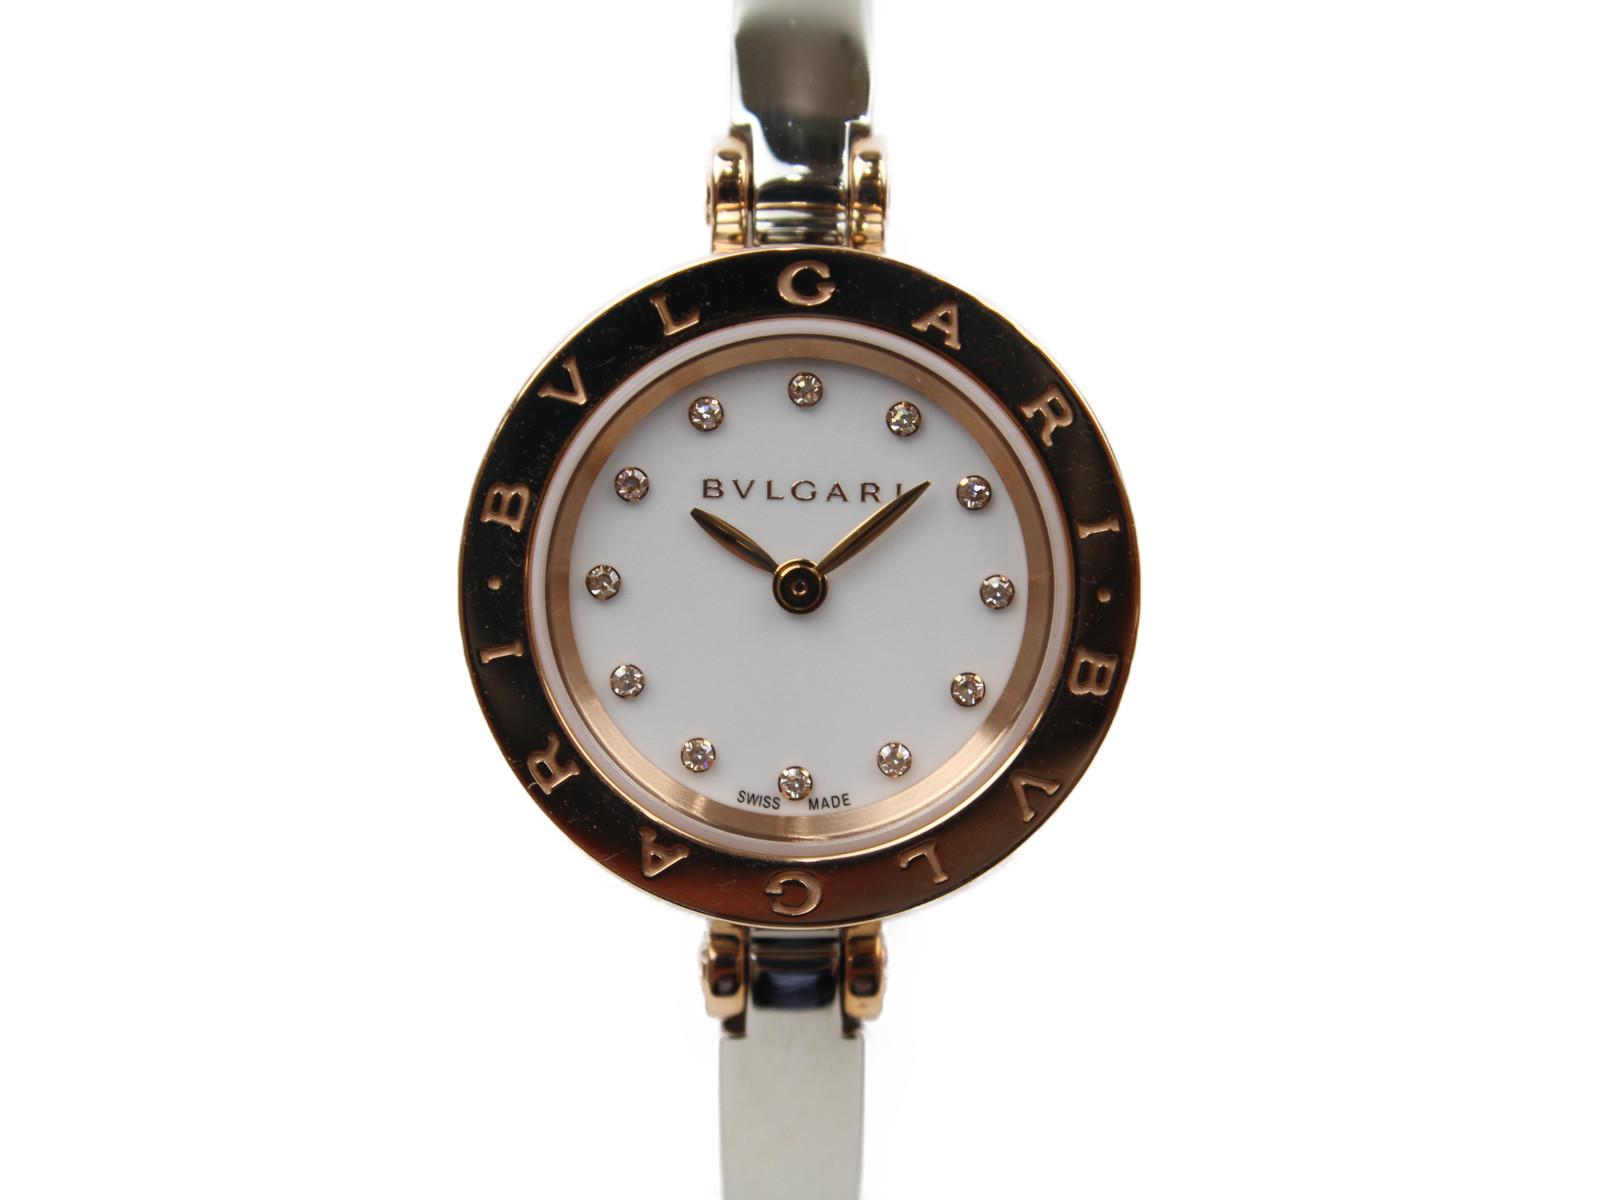 BVLGARI ブルガリ B.ZERO1  ビーゼロワン BZ23WSGS/12 クオーツ K18 ピンクゴールド SS ダイヤモンド ホワイト レディース 腕時計 【中古】